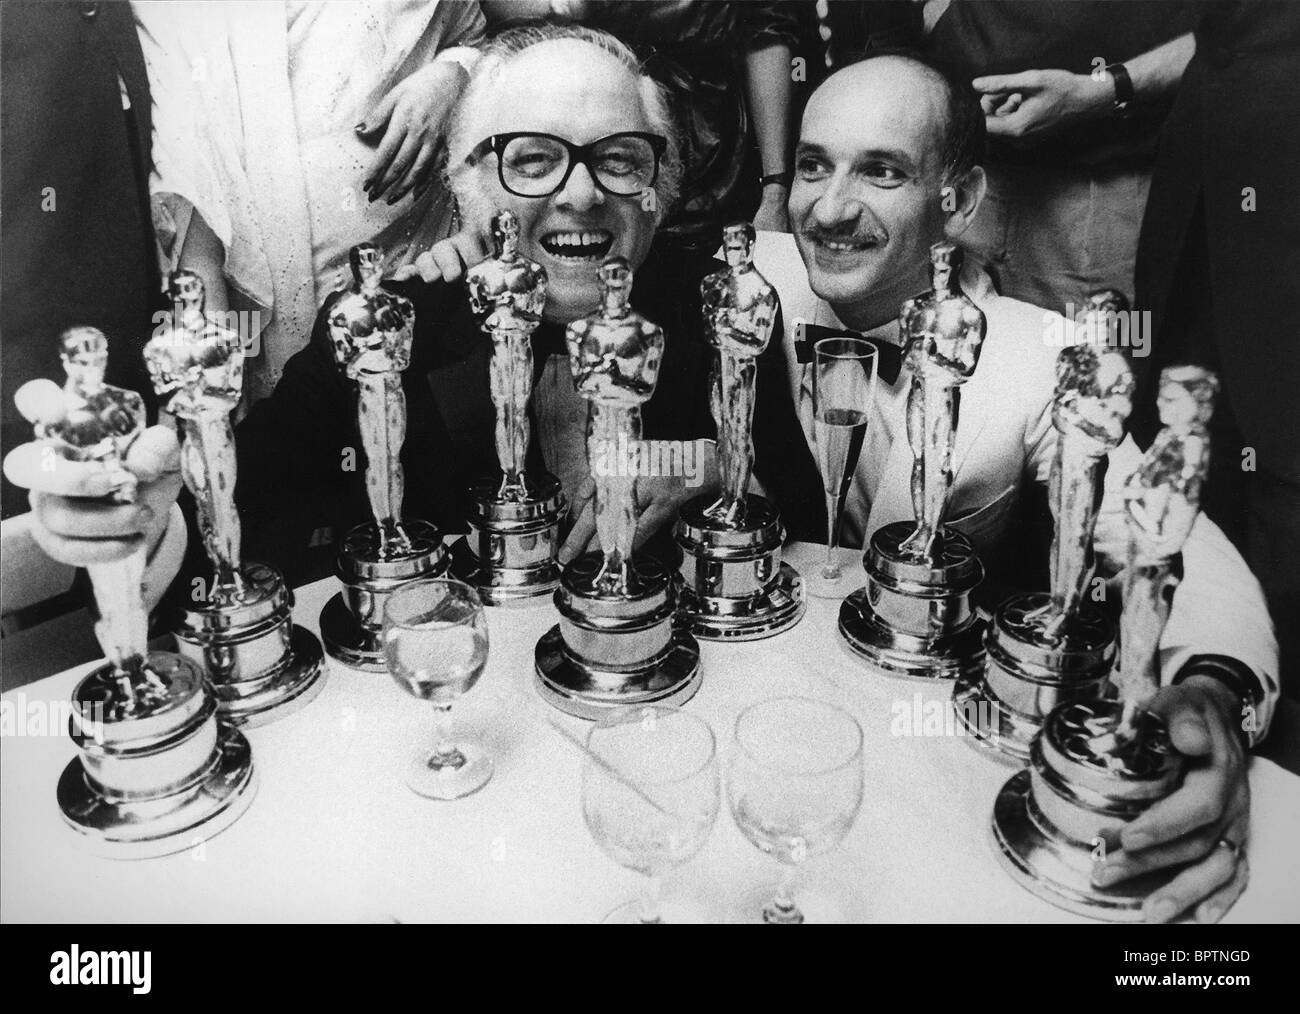 SIR R ATTENBOROUGH & BEN KINGSLEY 9 OSCARS AWARDED FOR 'GANDHI' (1983) - Stock Image